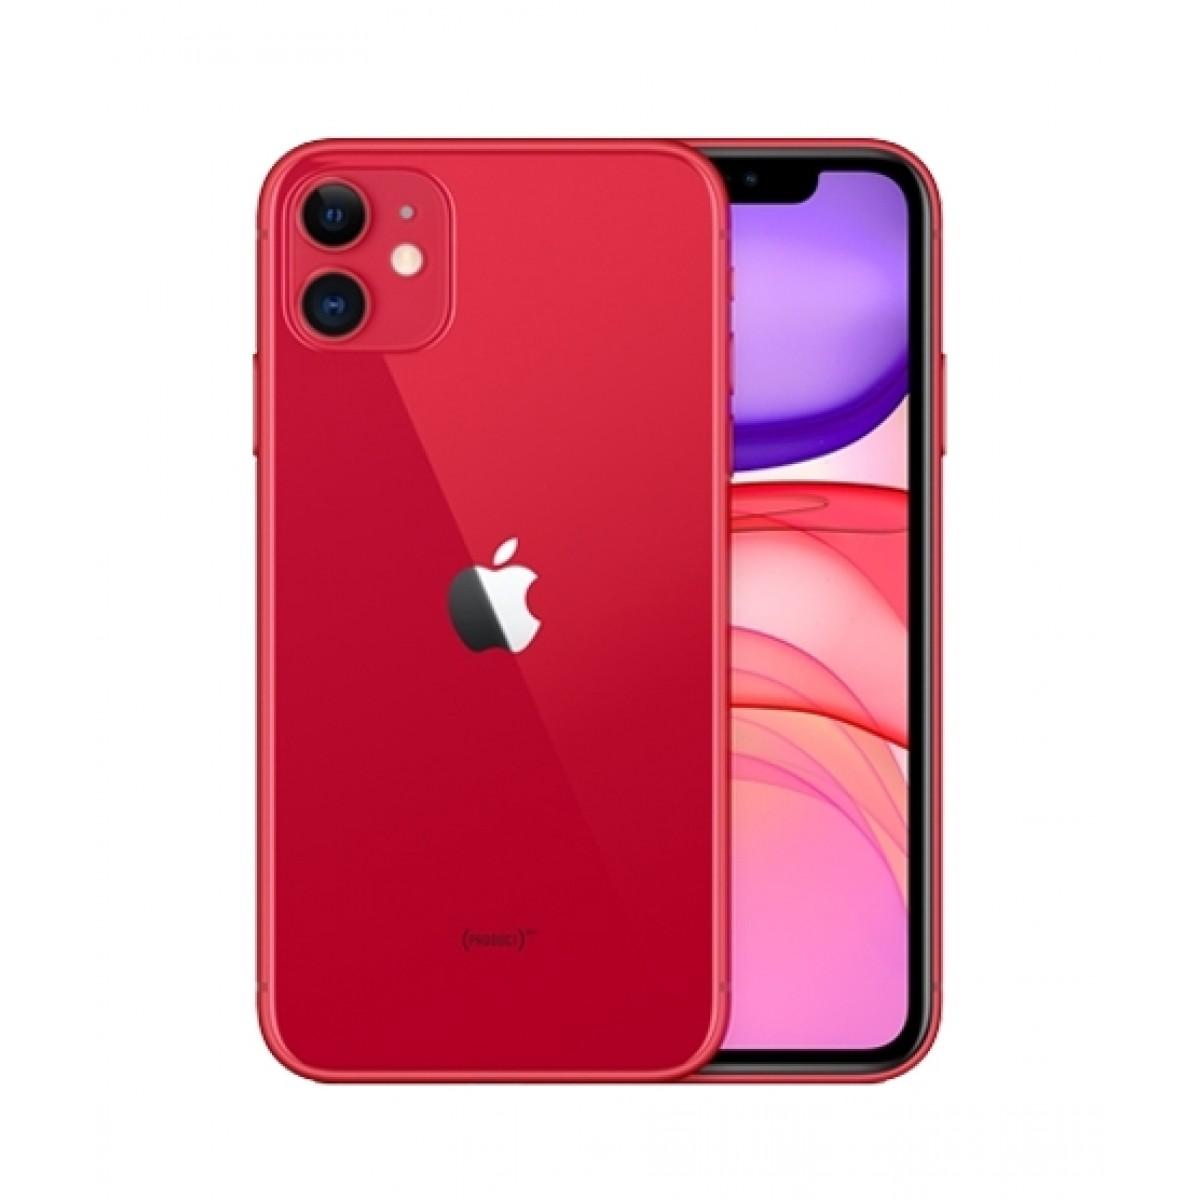 Apple iPhone 11 256GB Dual Sim Red - Non PTA Compliant